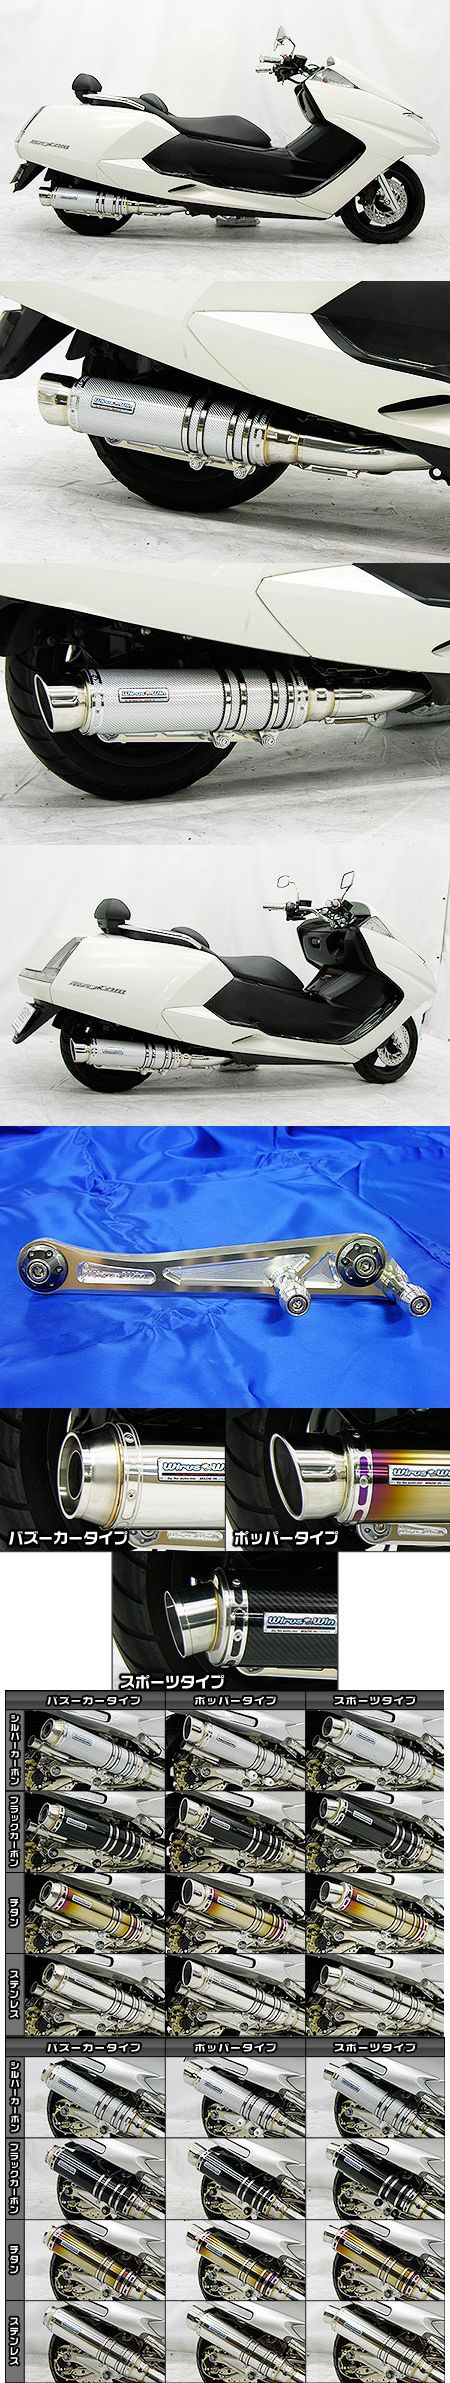 Ultimate全段排氣管 銀色碳纖維款式 Popper型